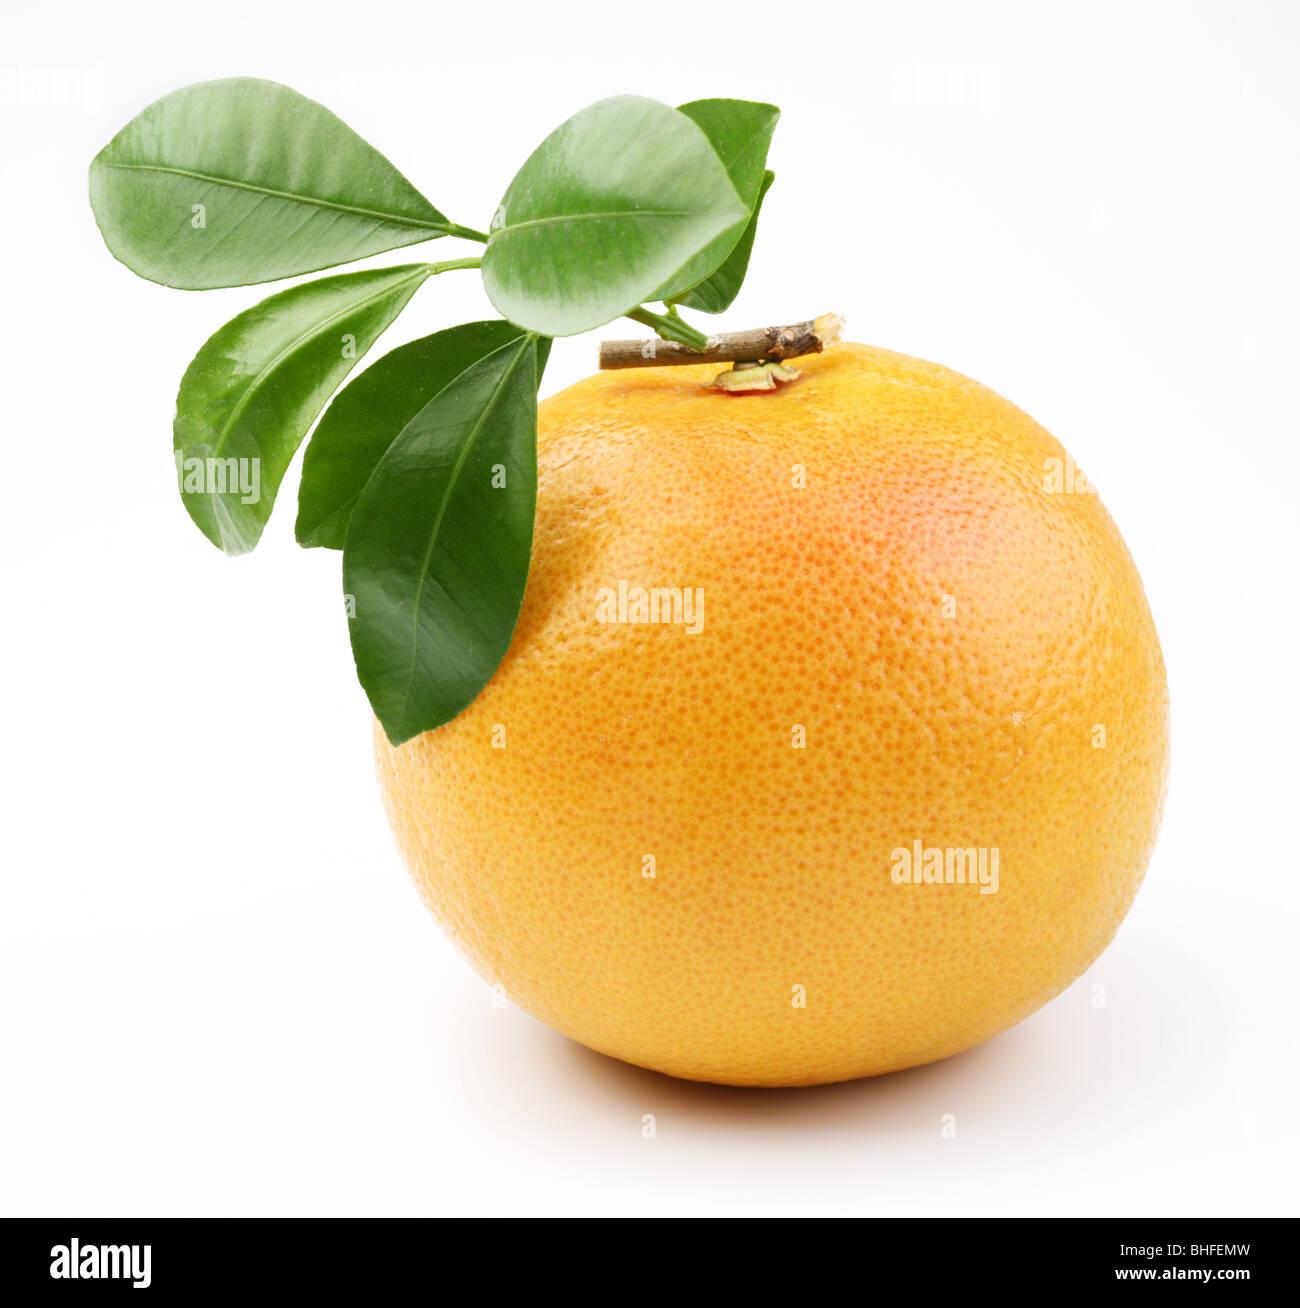 Ripe grapefruit on a white background - Stock Image